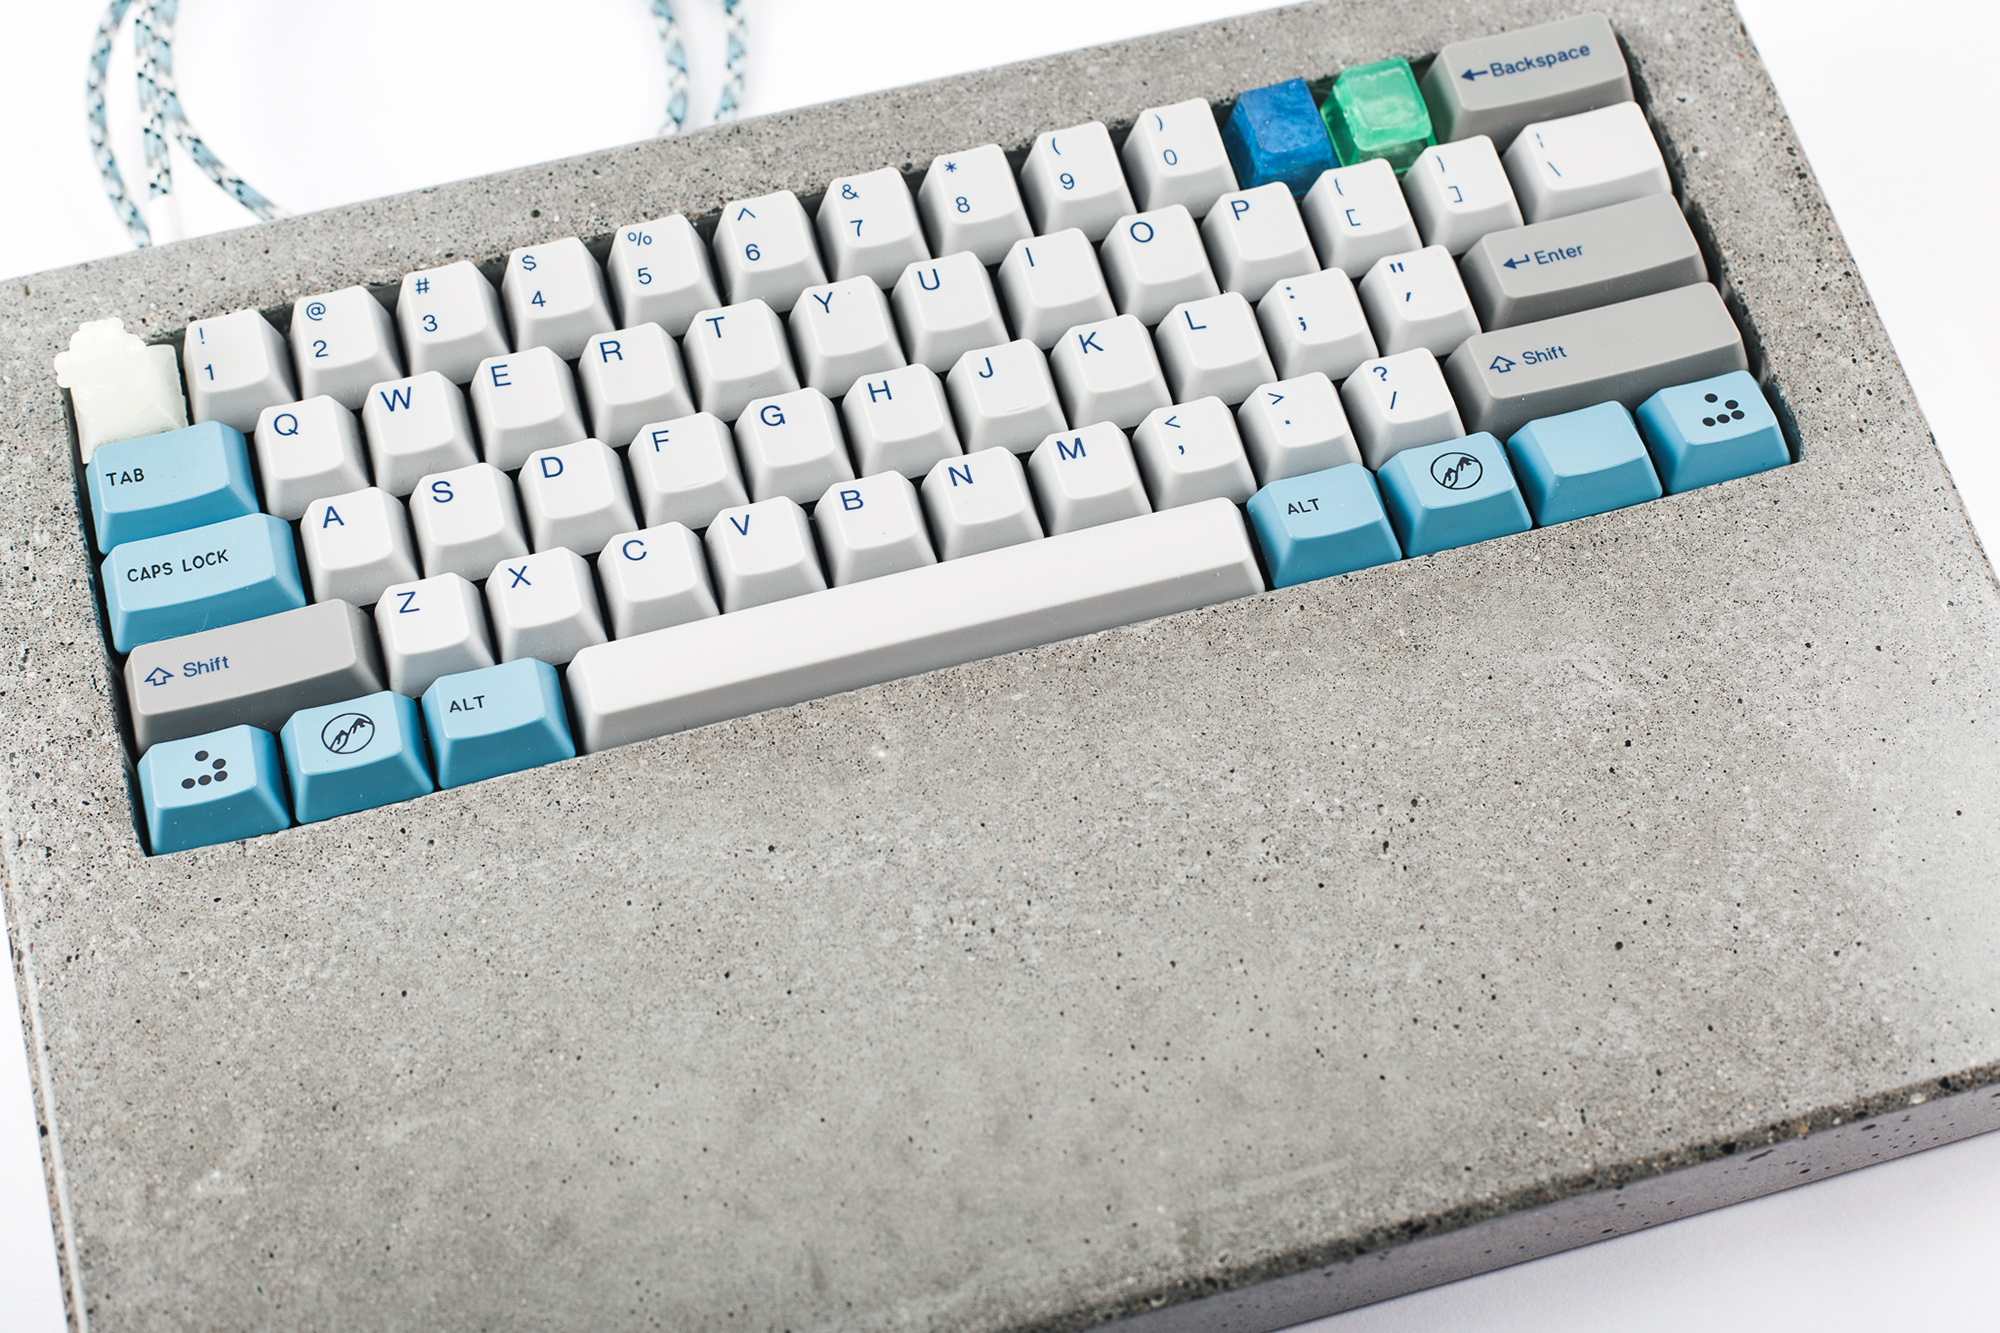 Cement tangentbord